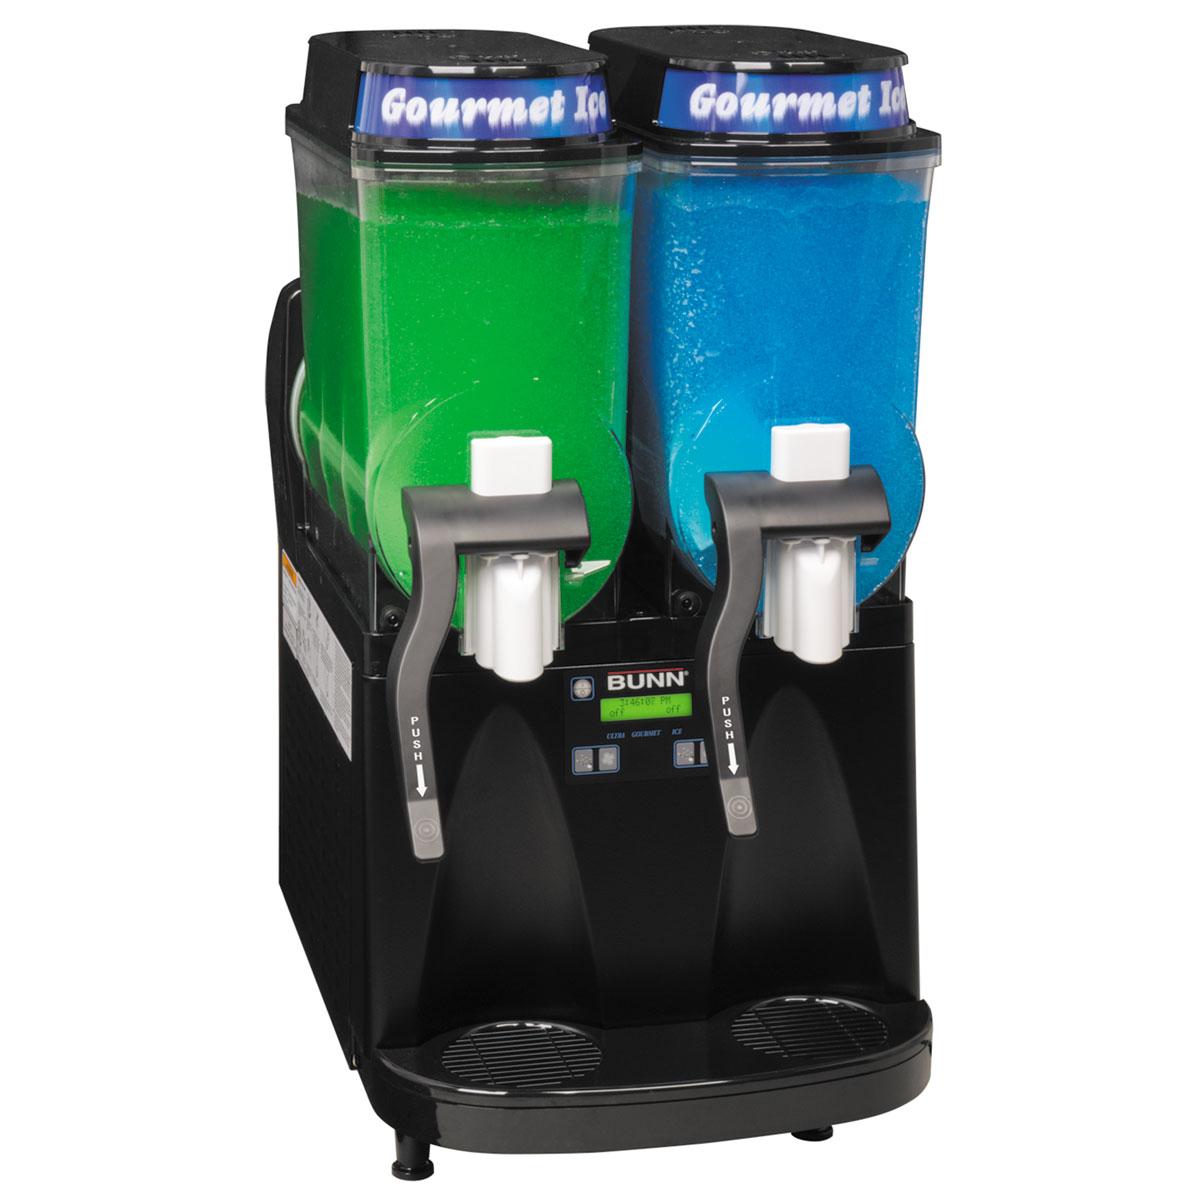 Picture of a Bunn Frozen Beverage Machine